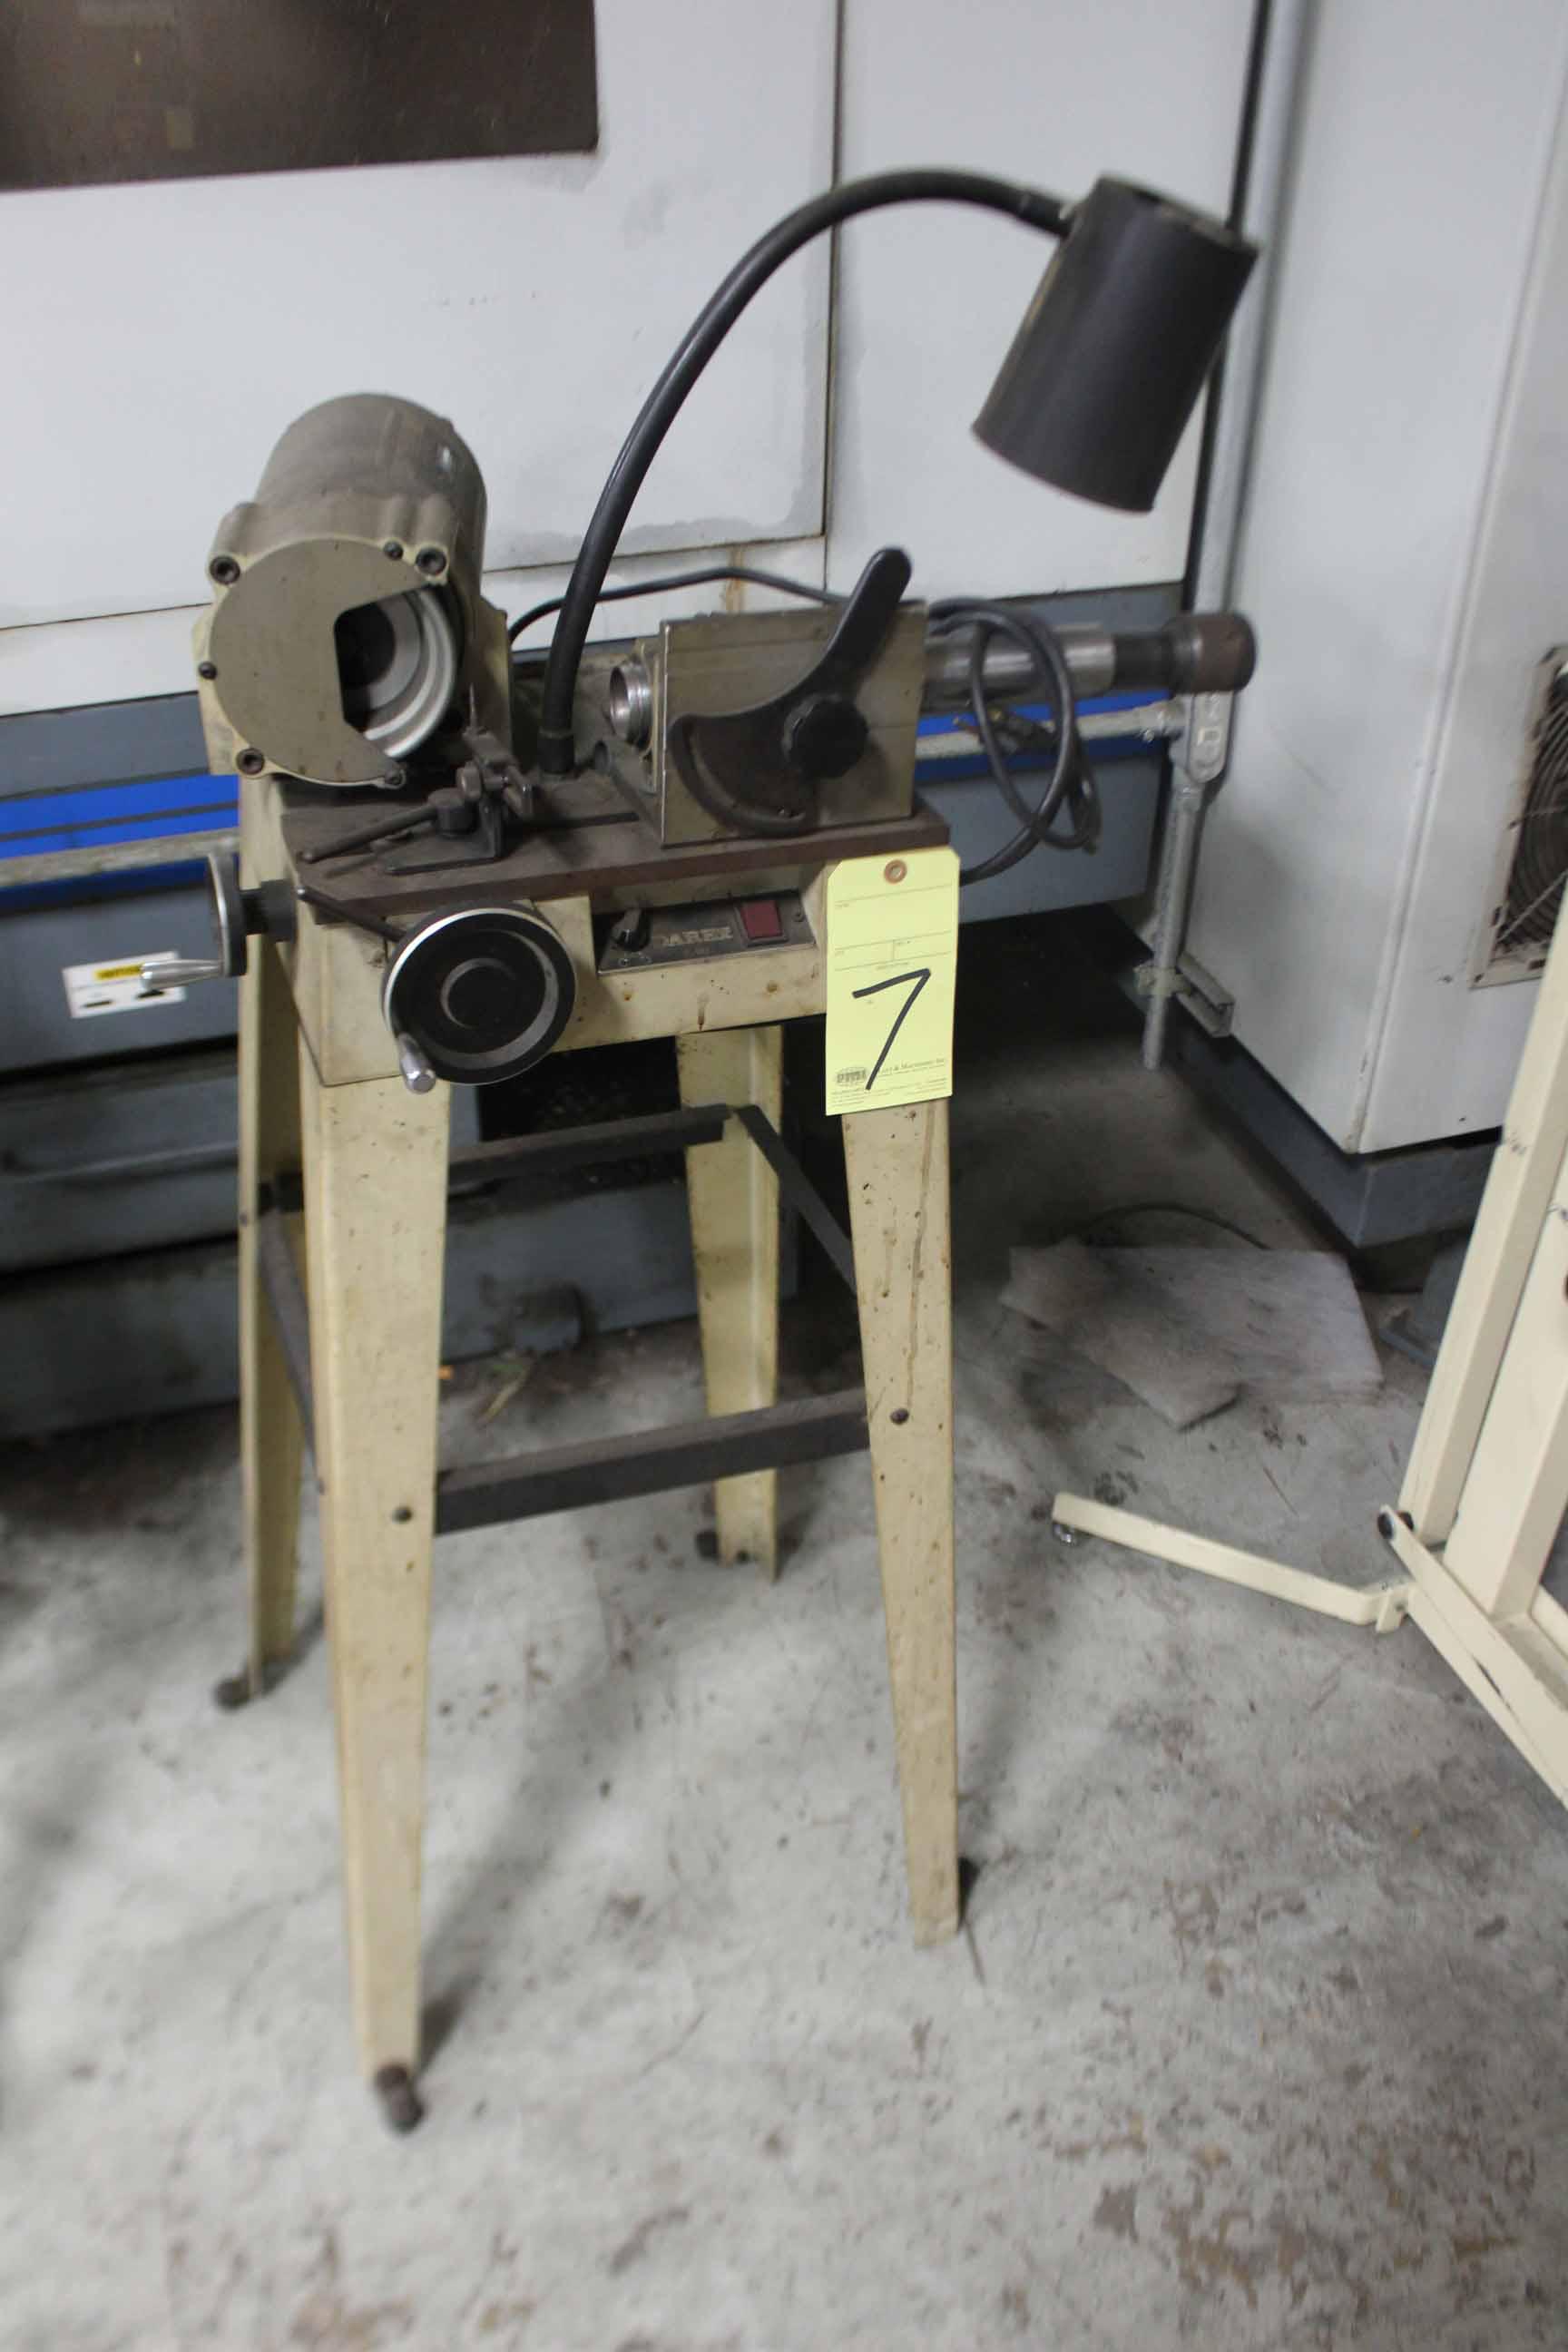 Lot 7 - DRILL SHARPENER, DAREX, 1/4 HP motor, S/N 93346